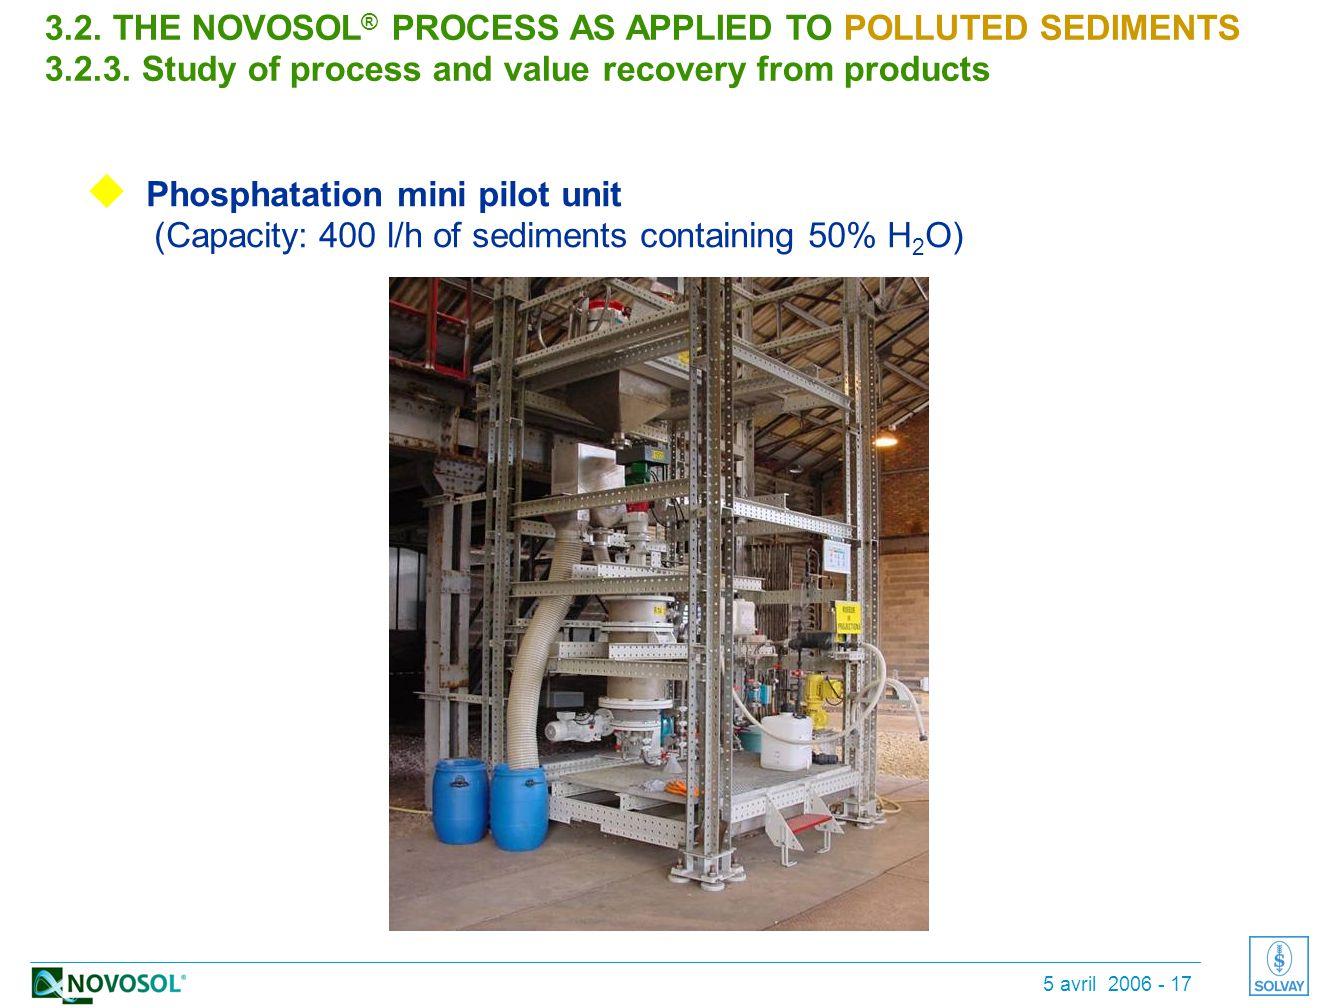 5 avril 2006 - 17  Phosphatation mini pilot unit (Capacity: 400 l/h of sediments containing 50% H 2 O) 3.2.